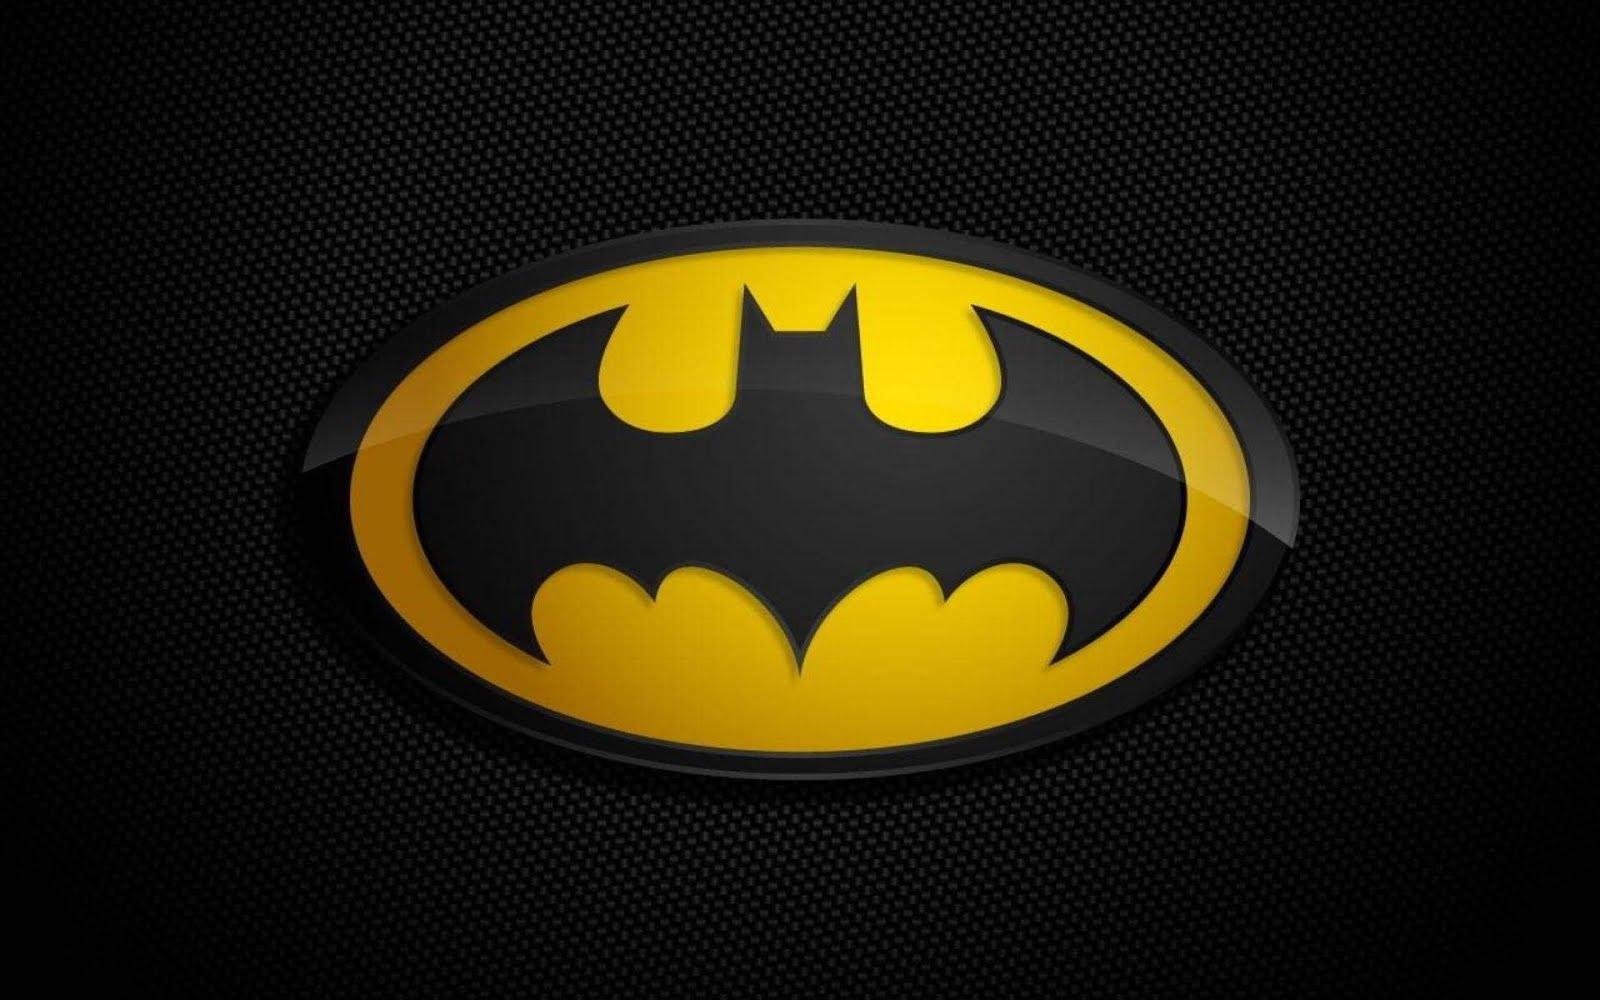 Batman cartoon movies wallpaper cartoon images for Sfondi batman